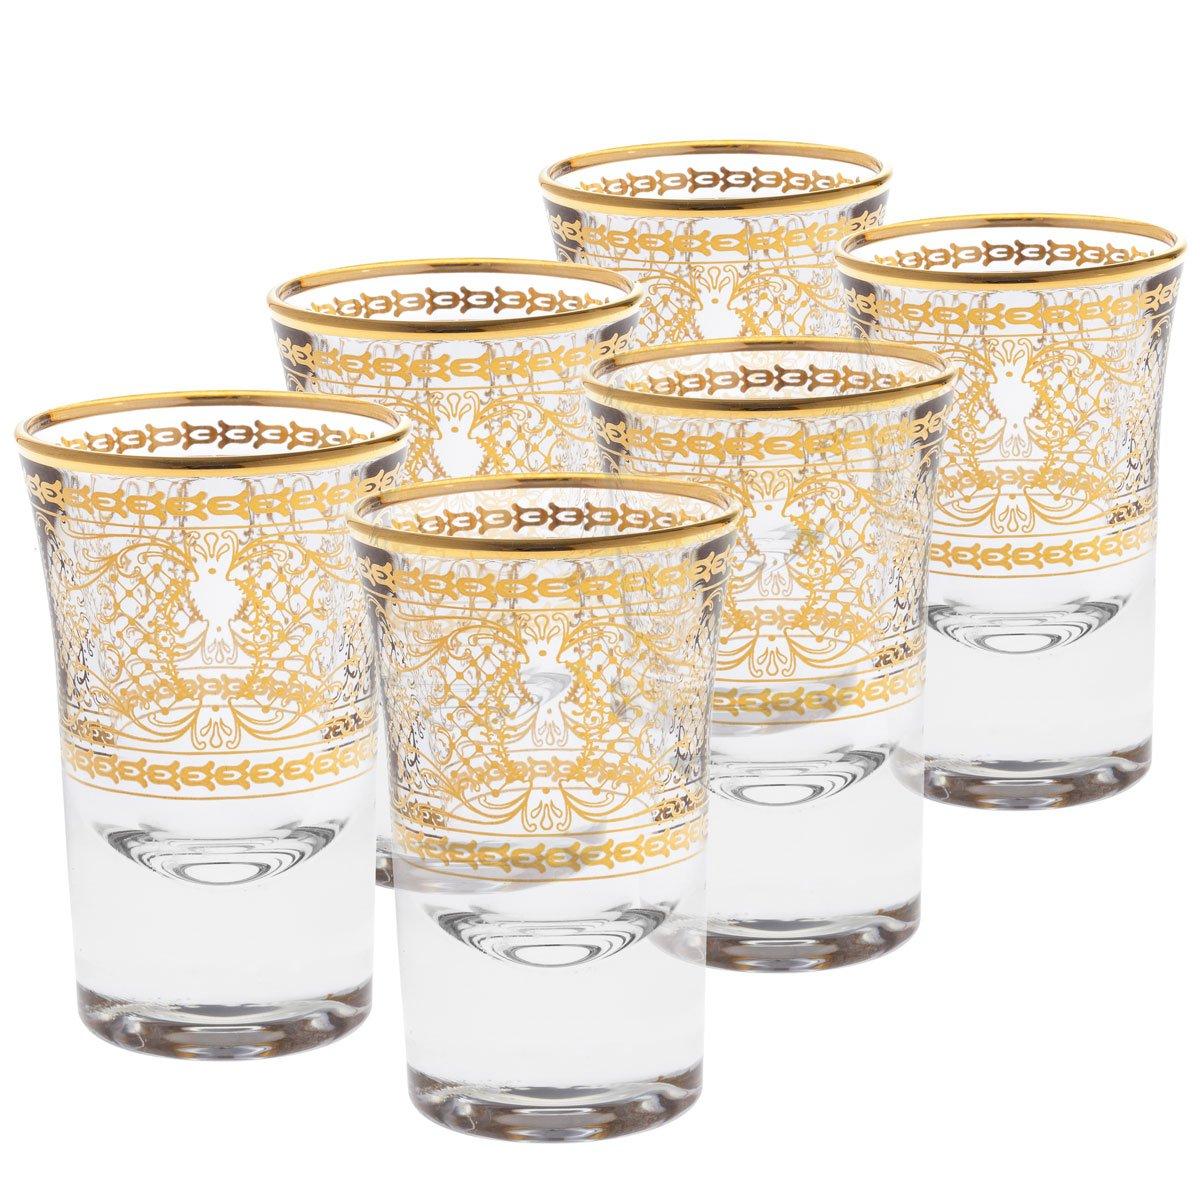 Rose's Glassware Fine Italian Liquor Cup Shotglass Set - 14 Karat GoldDesign - Set of 6 by Rose's Glassware (Image #1)